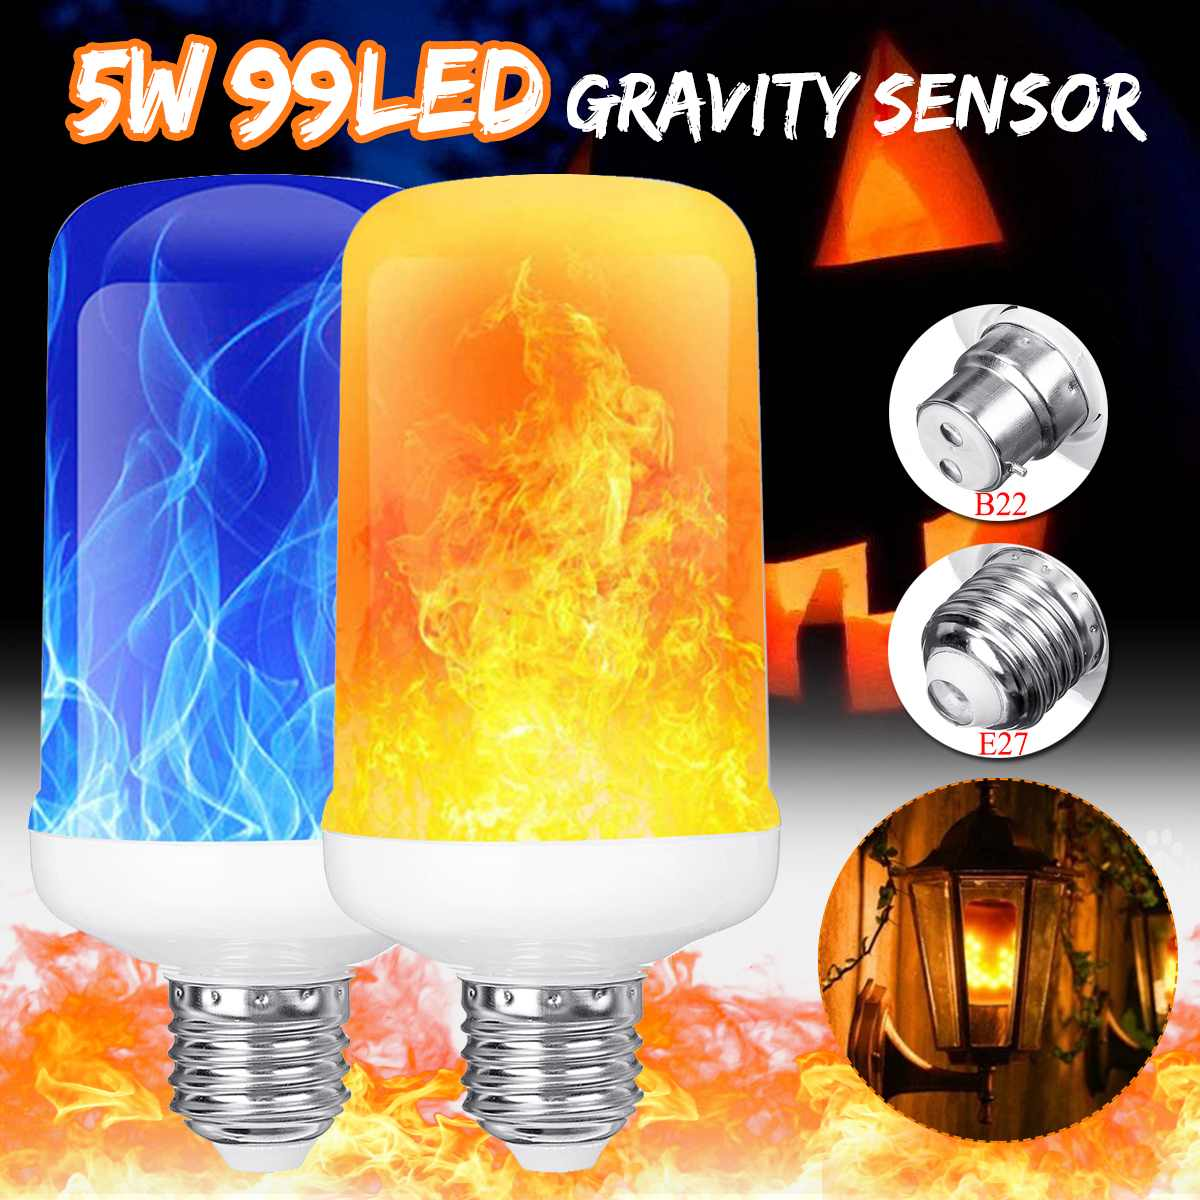 Bombilla de llama Smuxi E27 B22, Bombilla LED con efecto de llama de fuego 85-265V, Bombilla de maíz parpadeante, lámpara de decoración, lámpara LED de iluminación